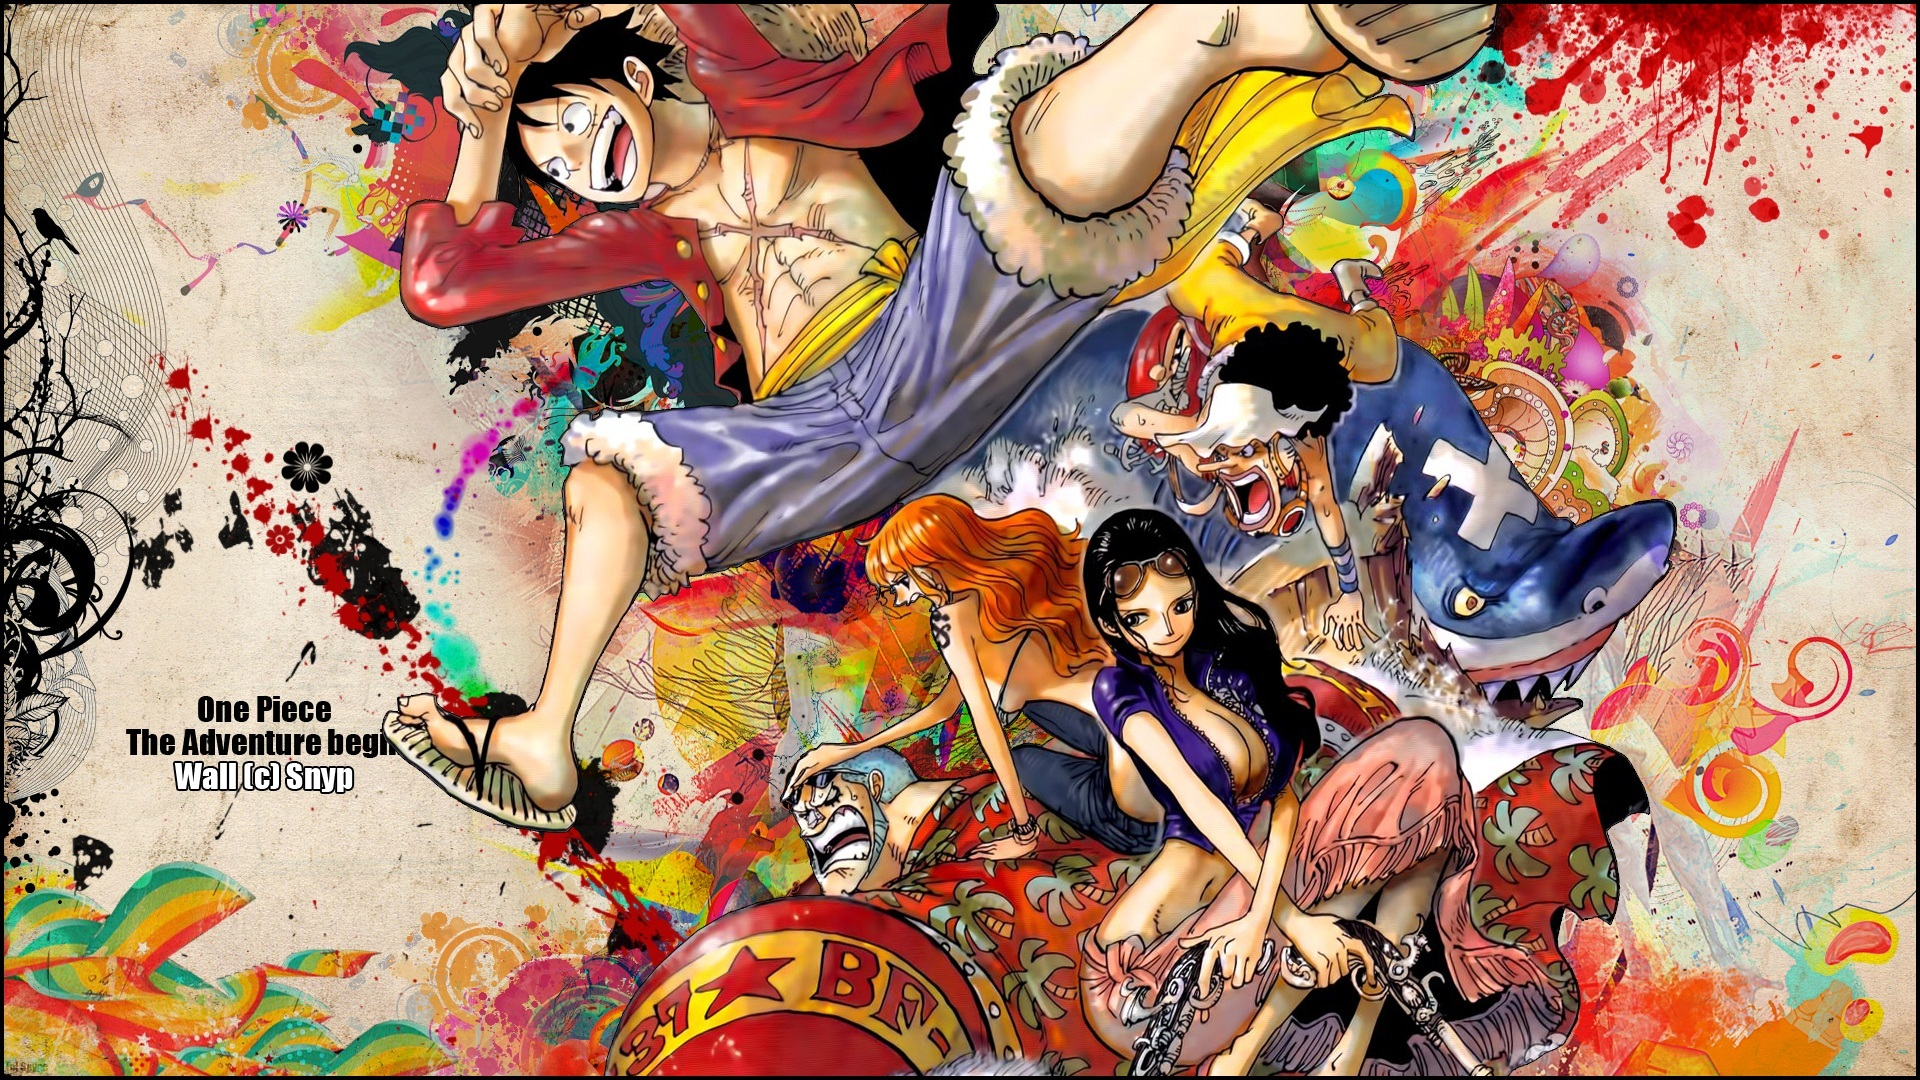 fond ecran hd manga one piece wallpaper background 1920x1080 picture 1920x1080